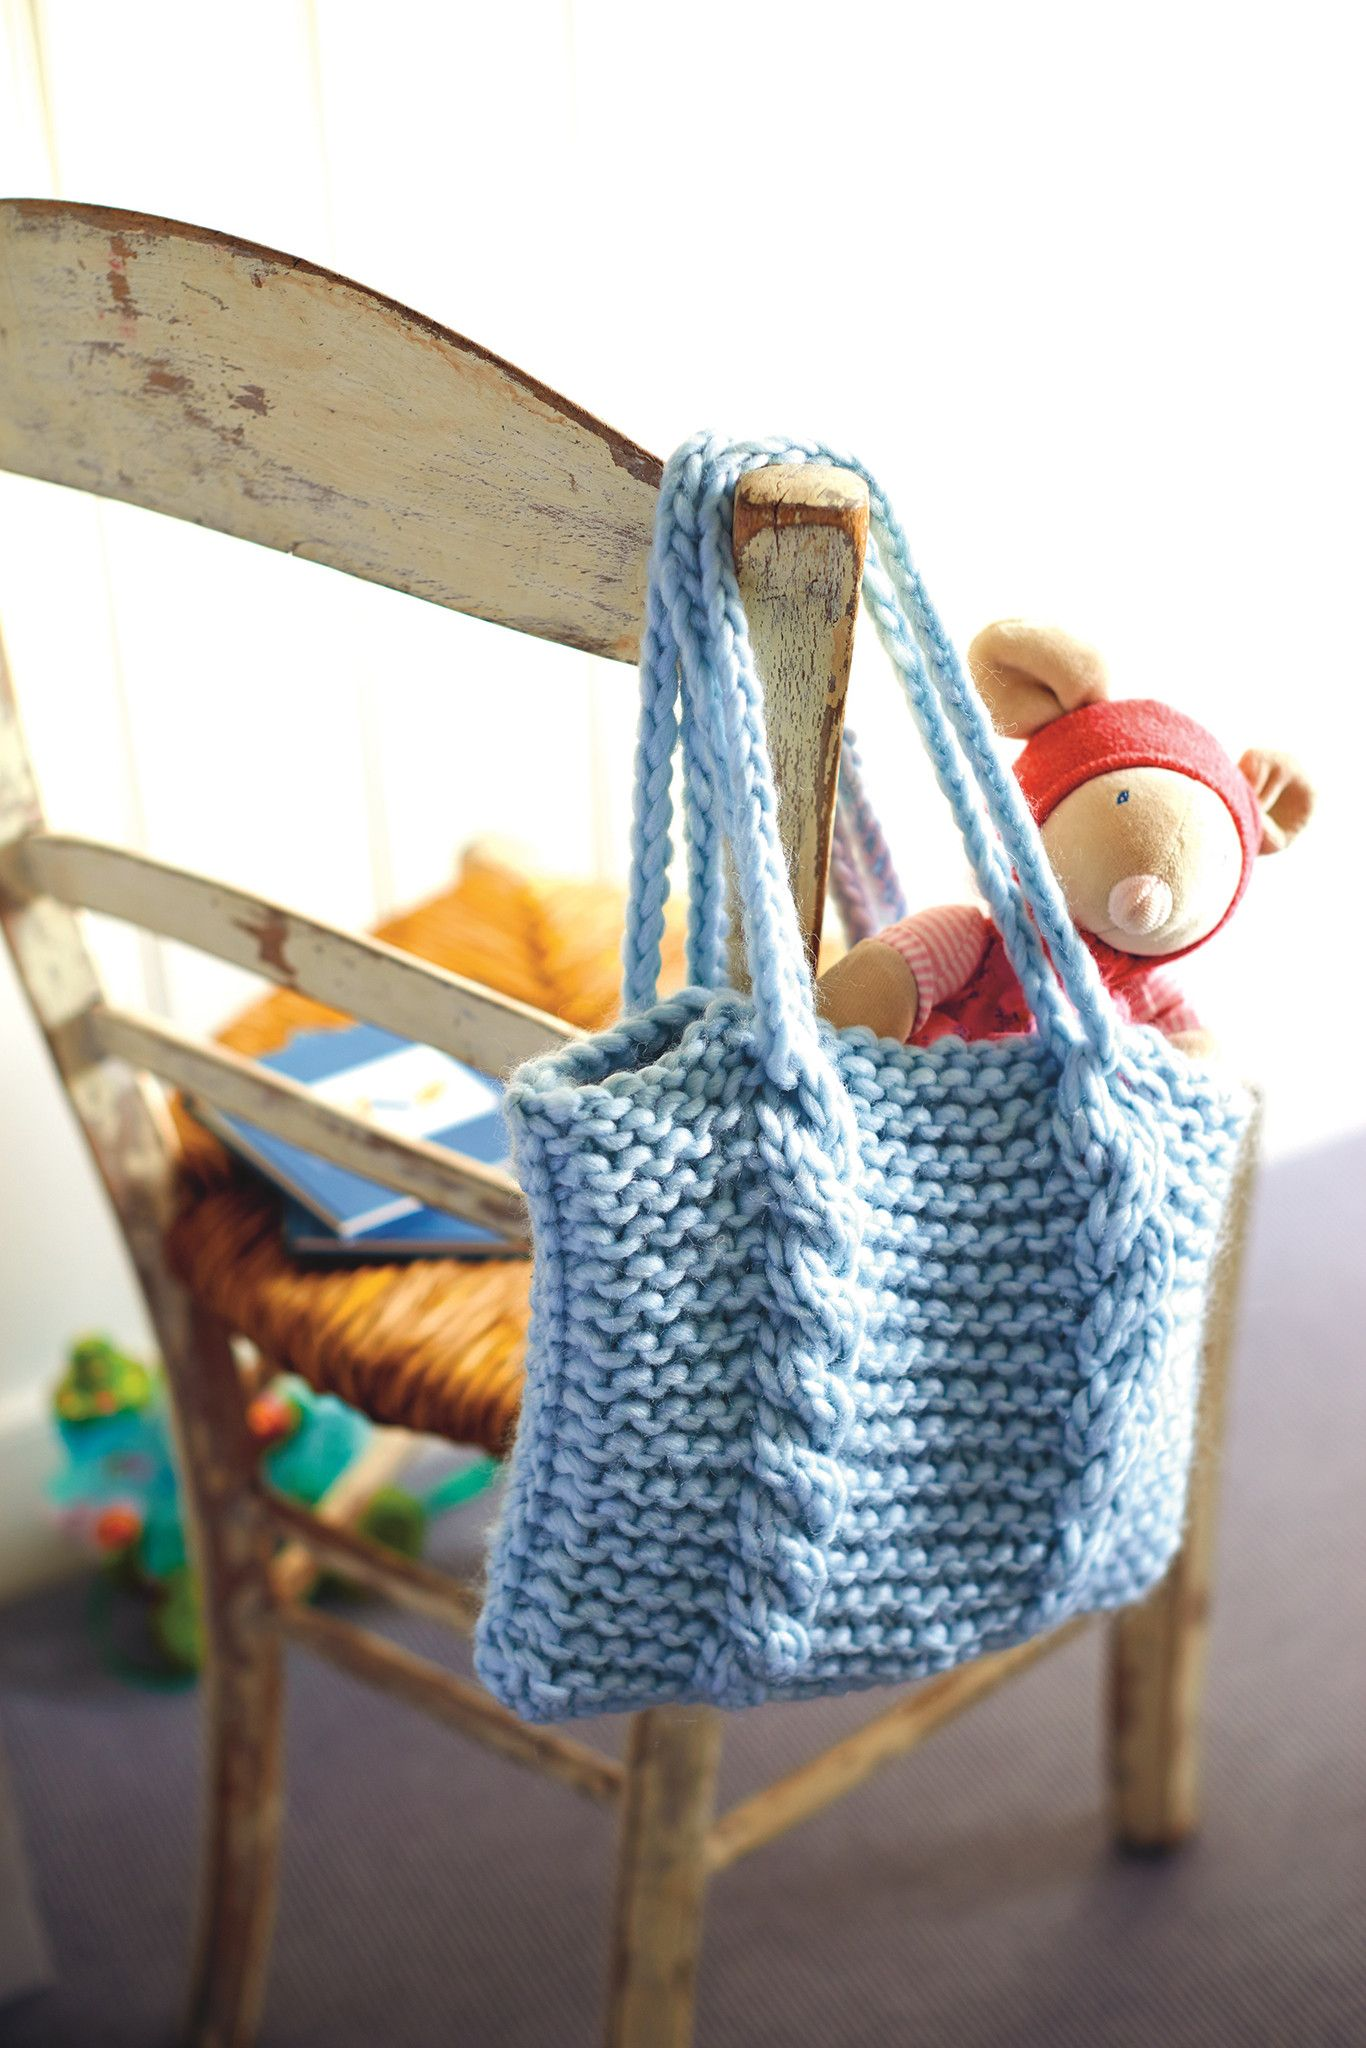 Chunky Bag Knitting Pattern | Bags, Knitted bags, Knitting ...